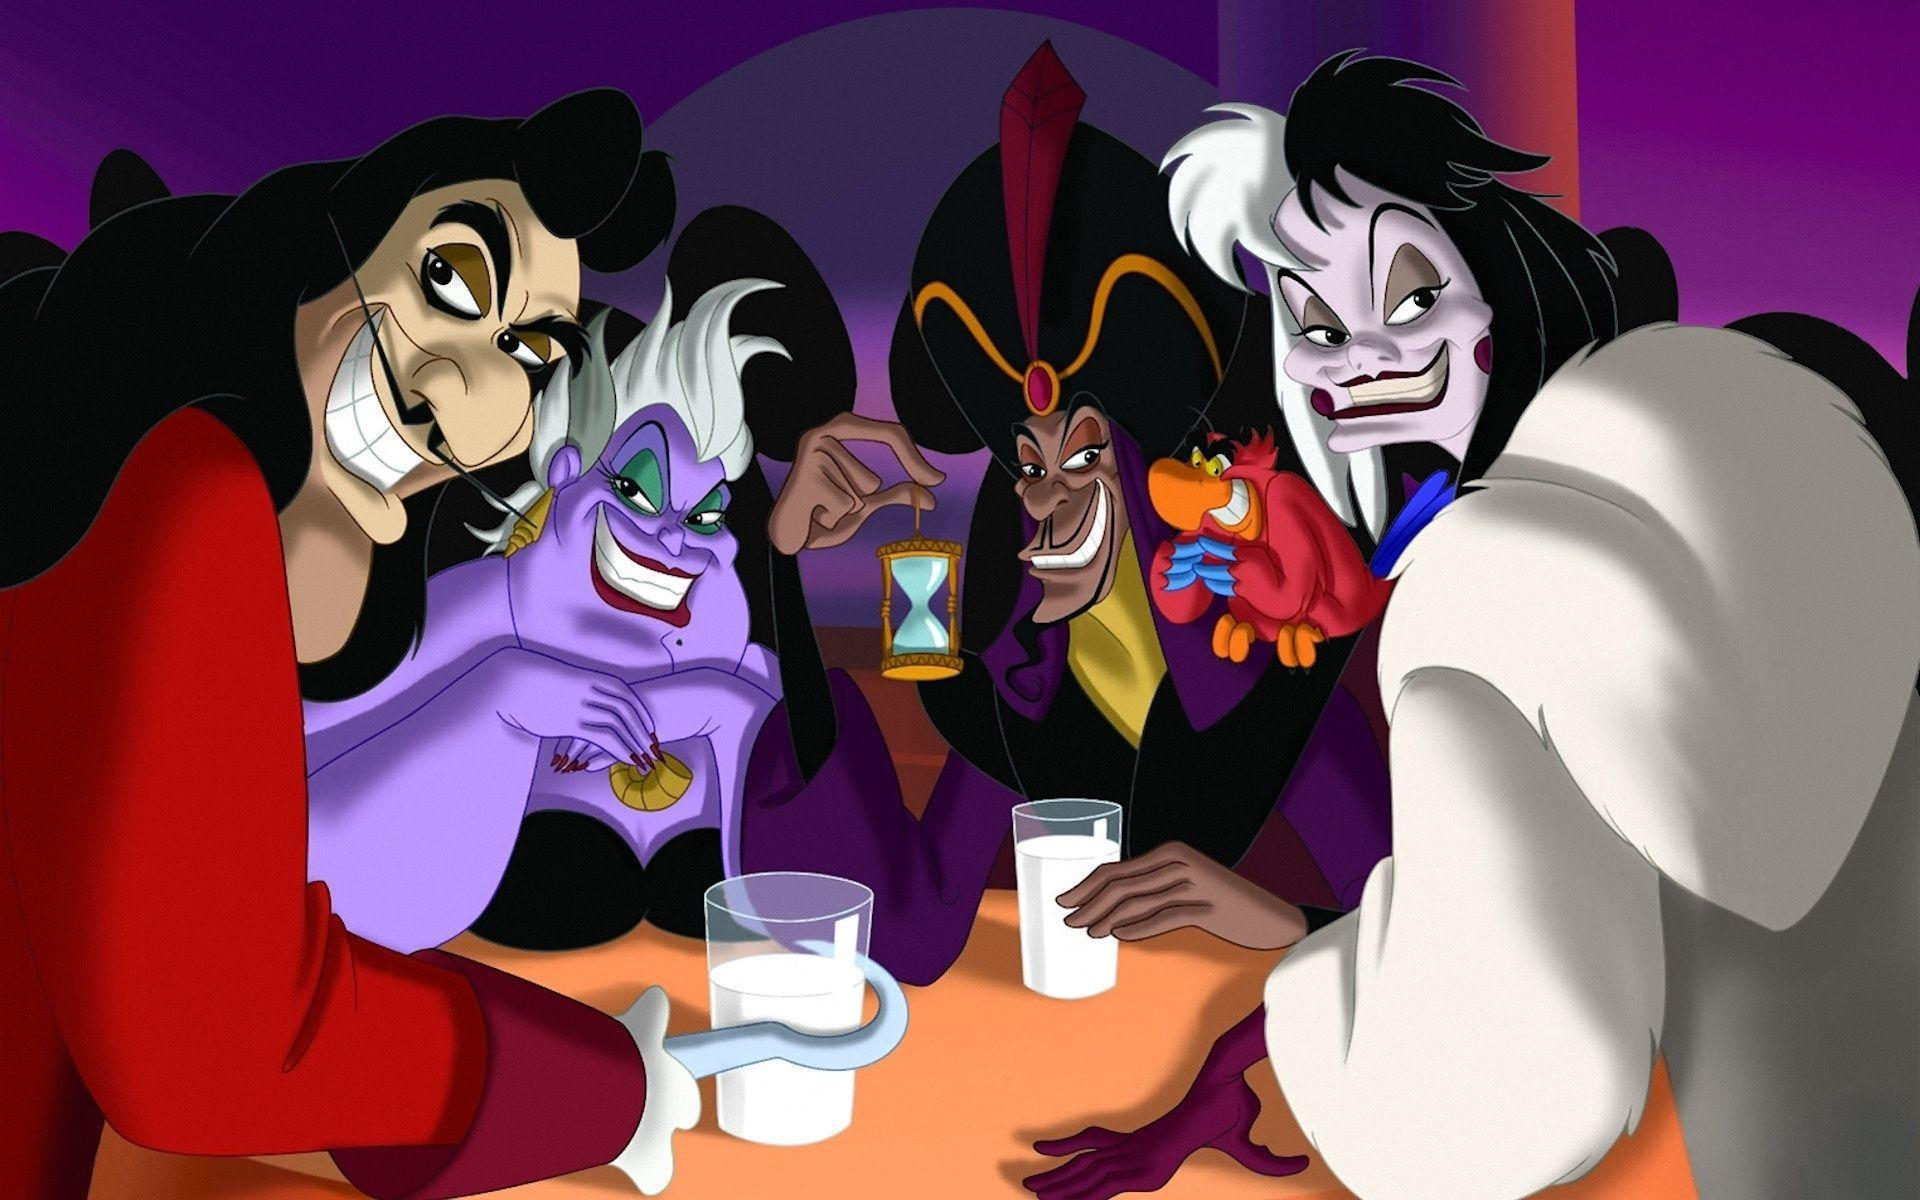 Disney Villains Wallpapers Wallpaper Cave